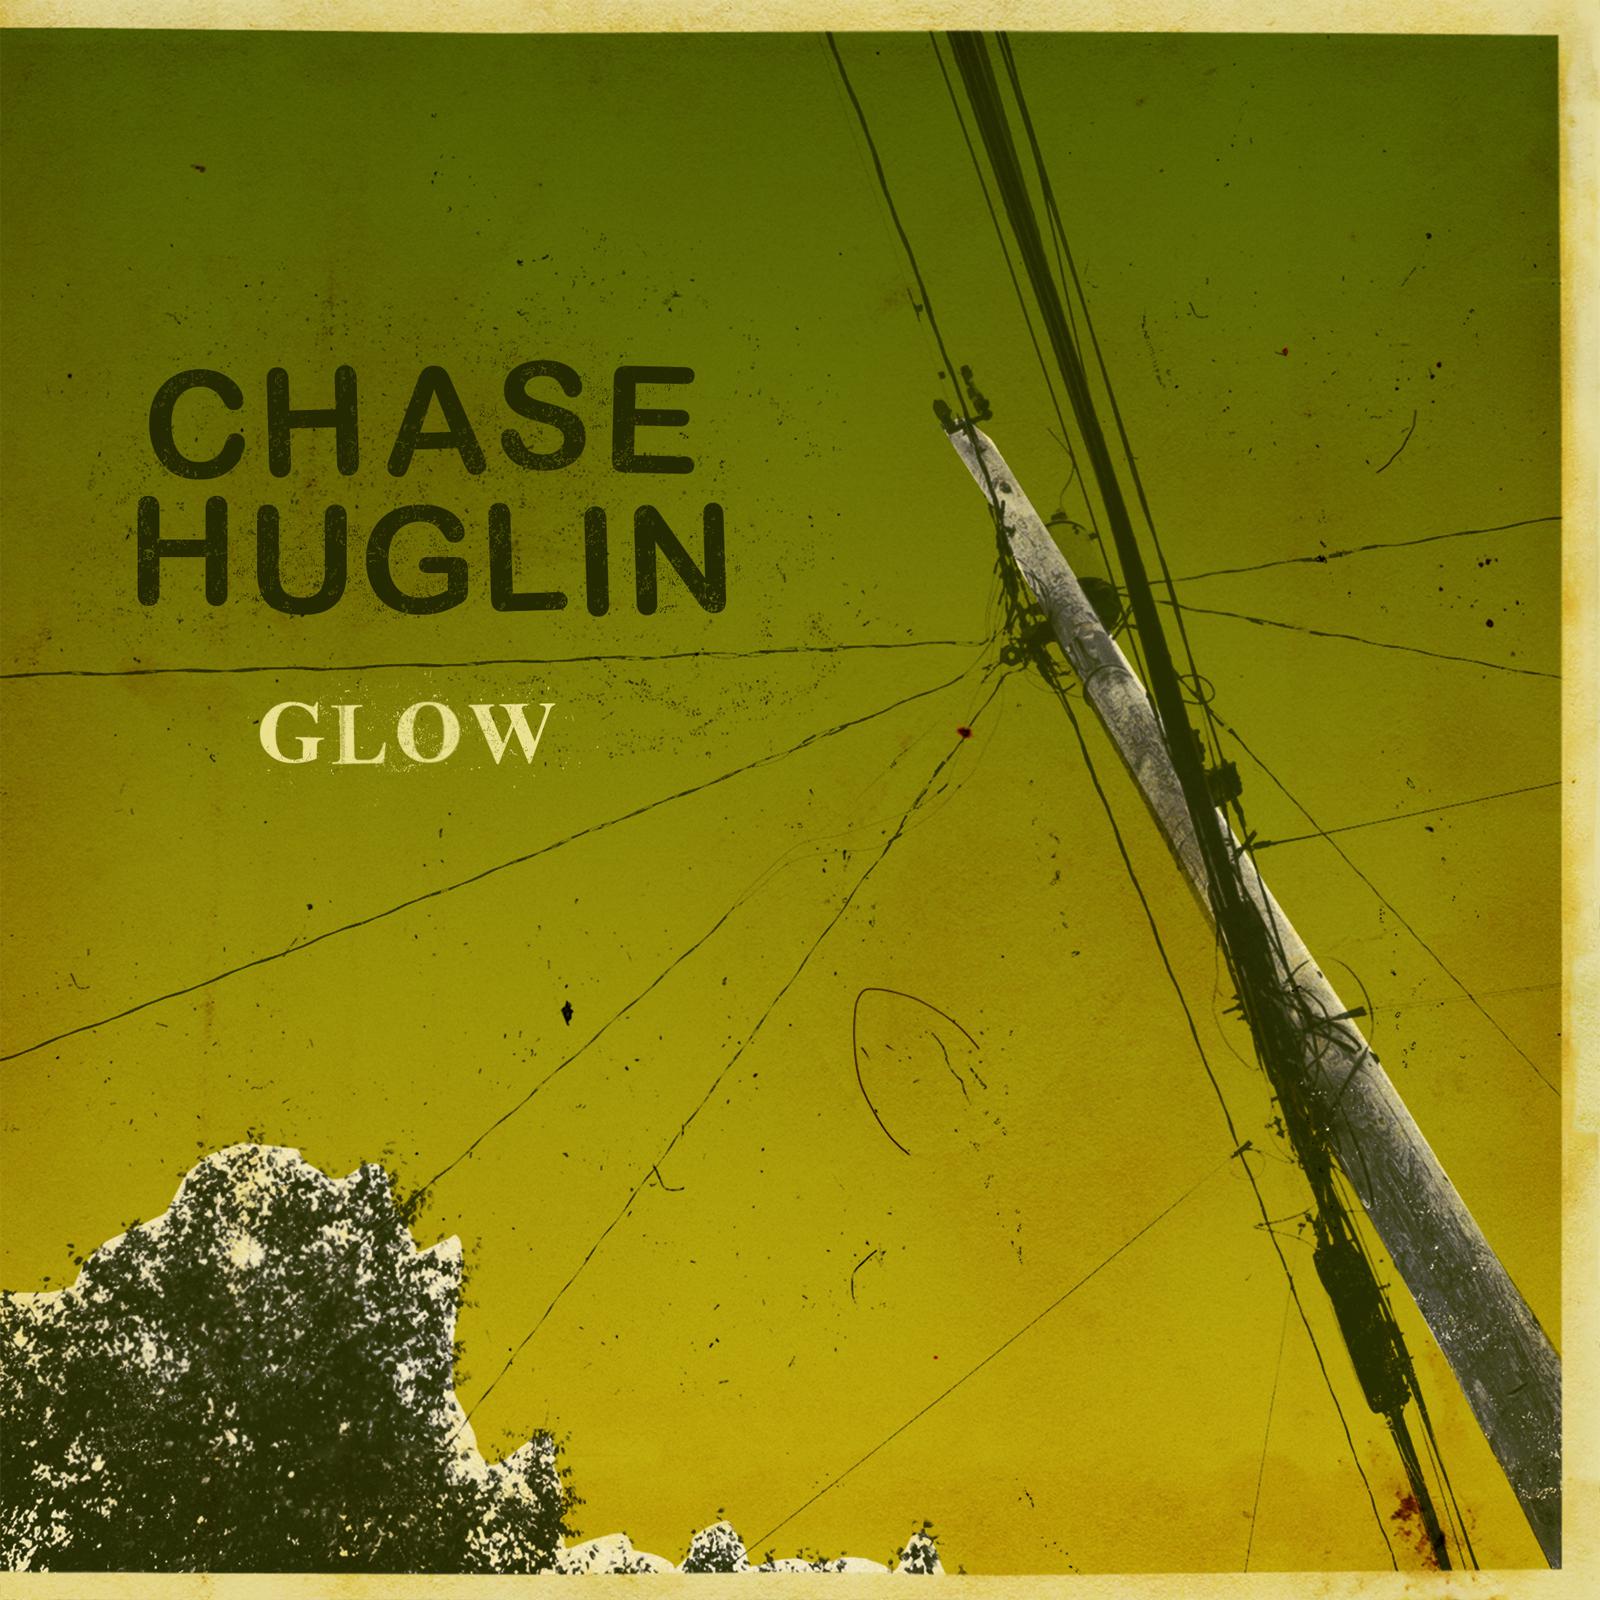 Chase Huglin - Glow 7